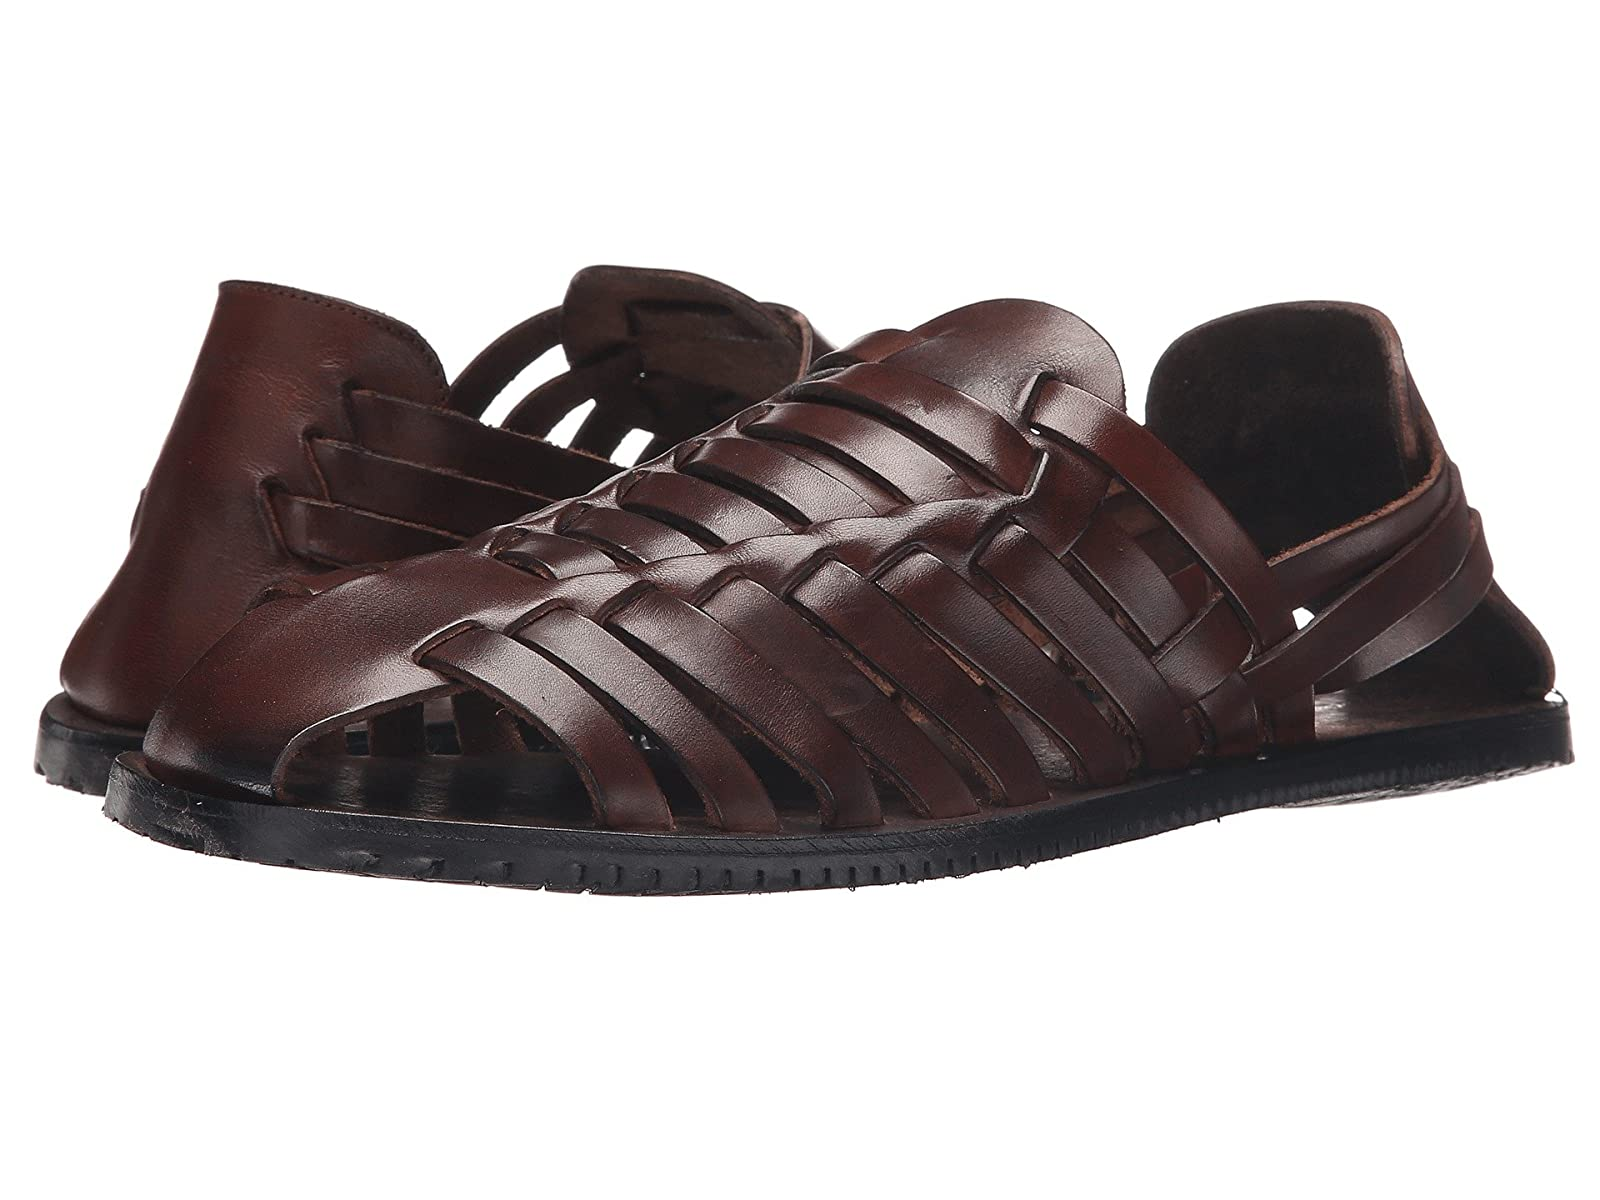 Massimo Matteo HuaracheAtmospheric grades have affordable shoes